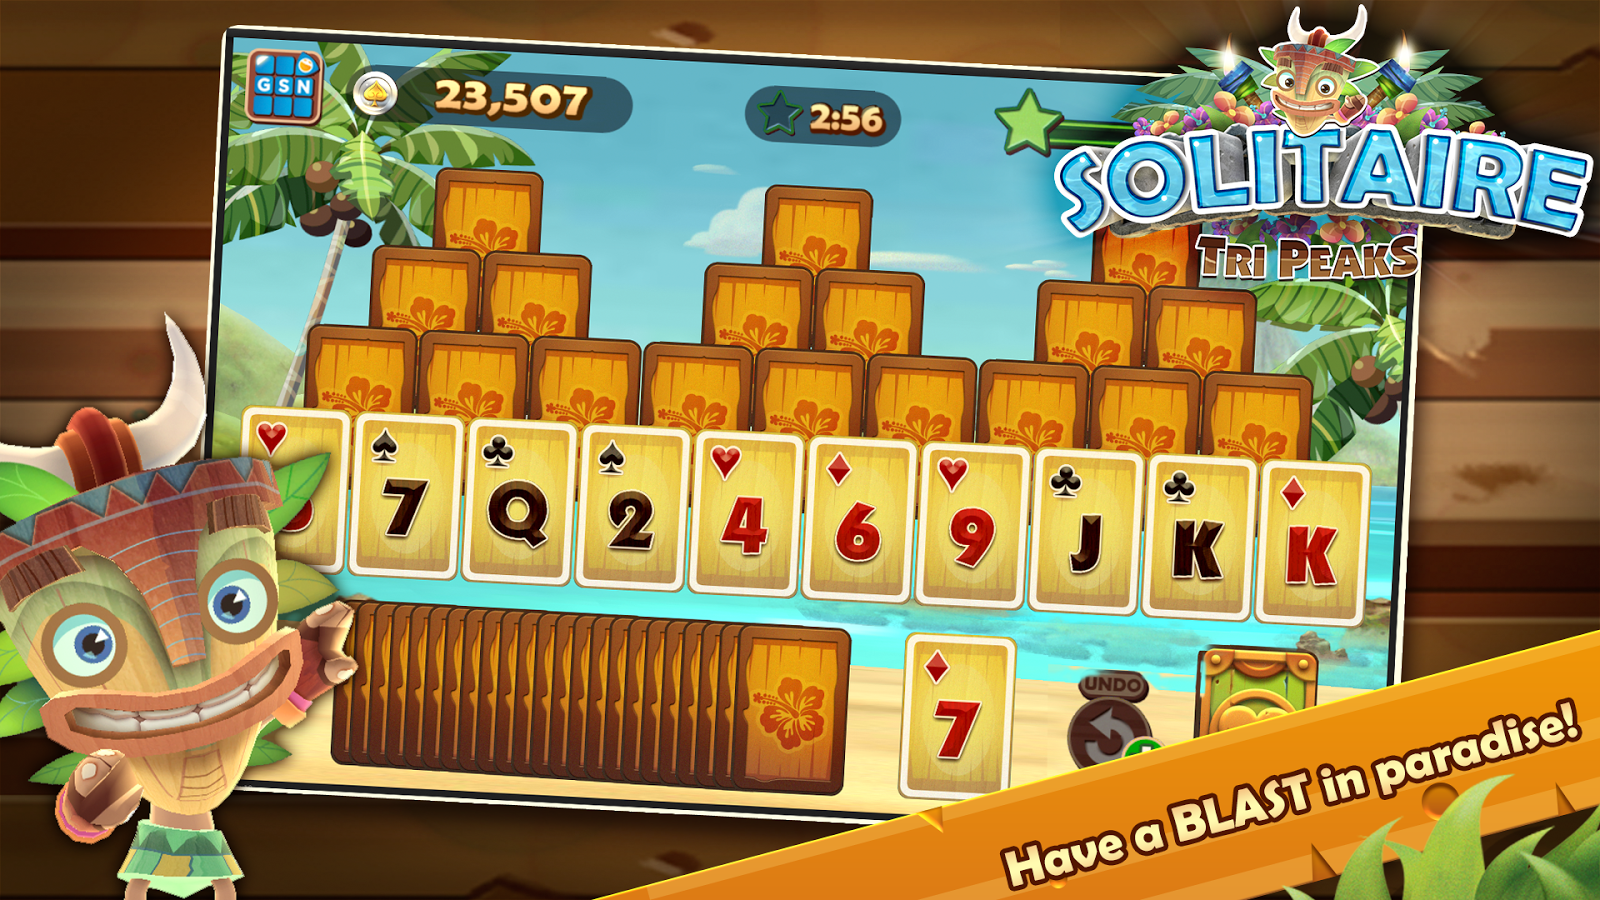 play tripeaks solitaire online